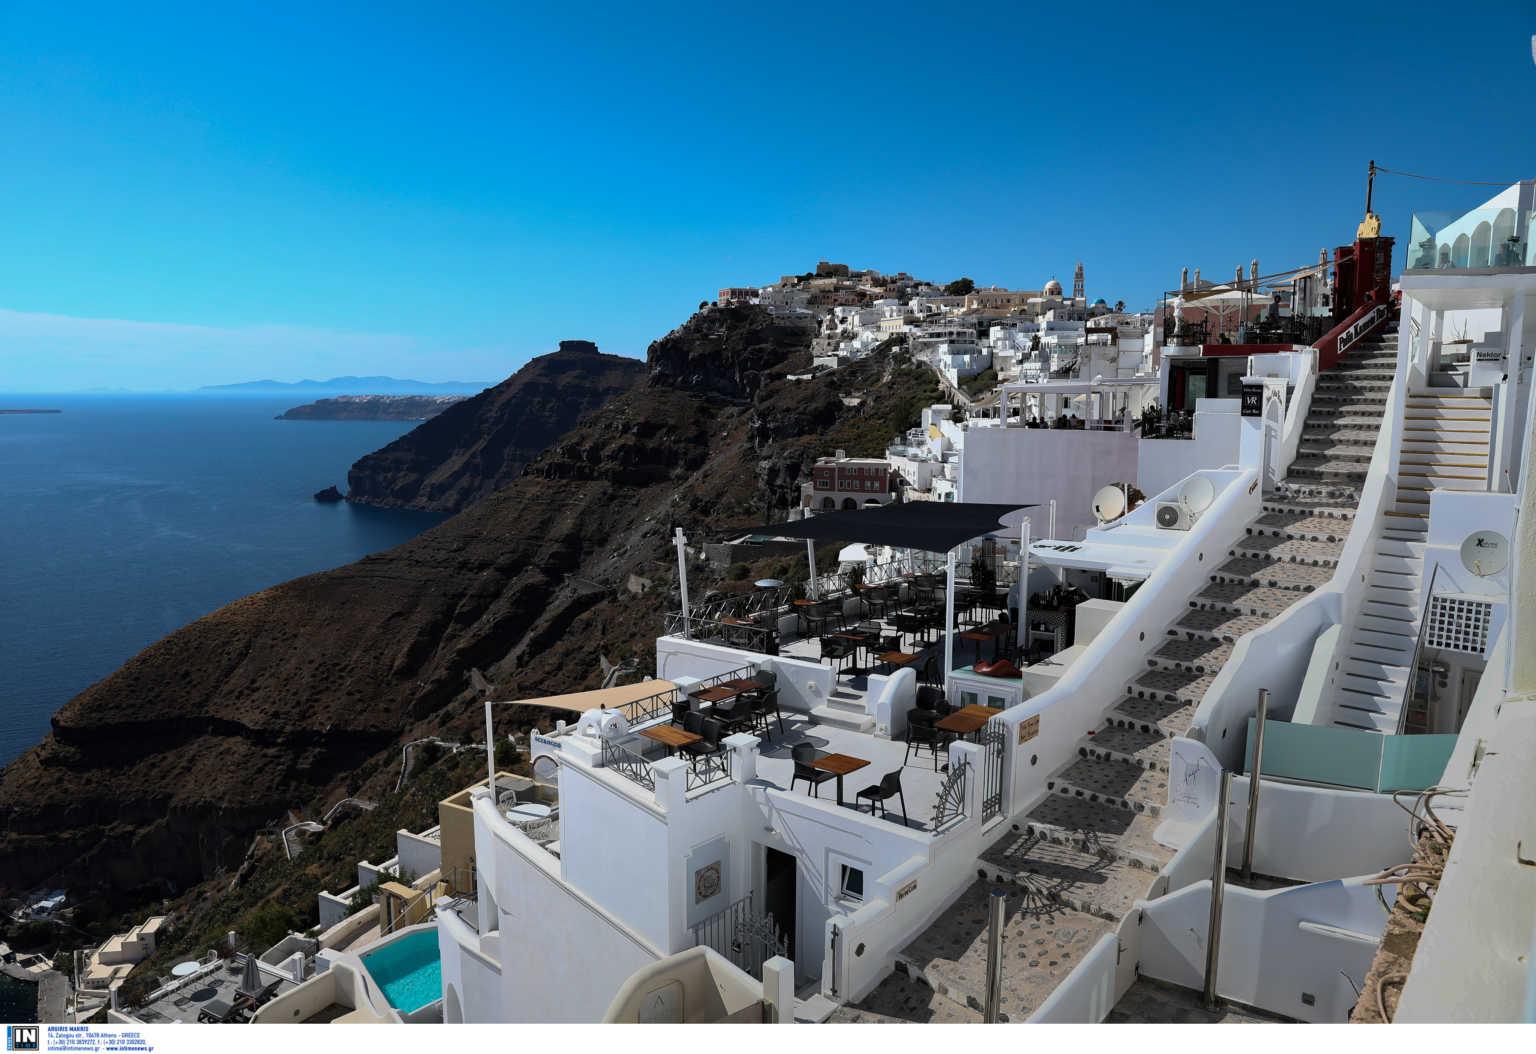 Fox News: Η Ελλάδα ετοιμάζεται να υποδεχτεί ξανά τους τουρίστες